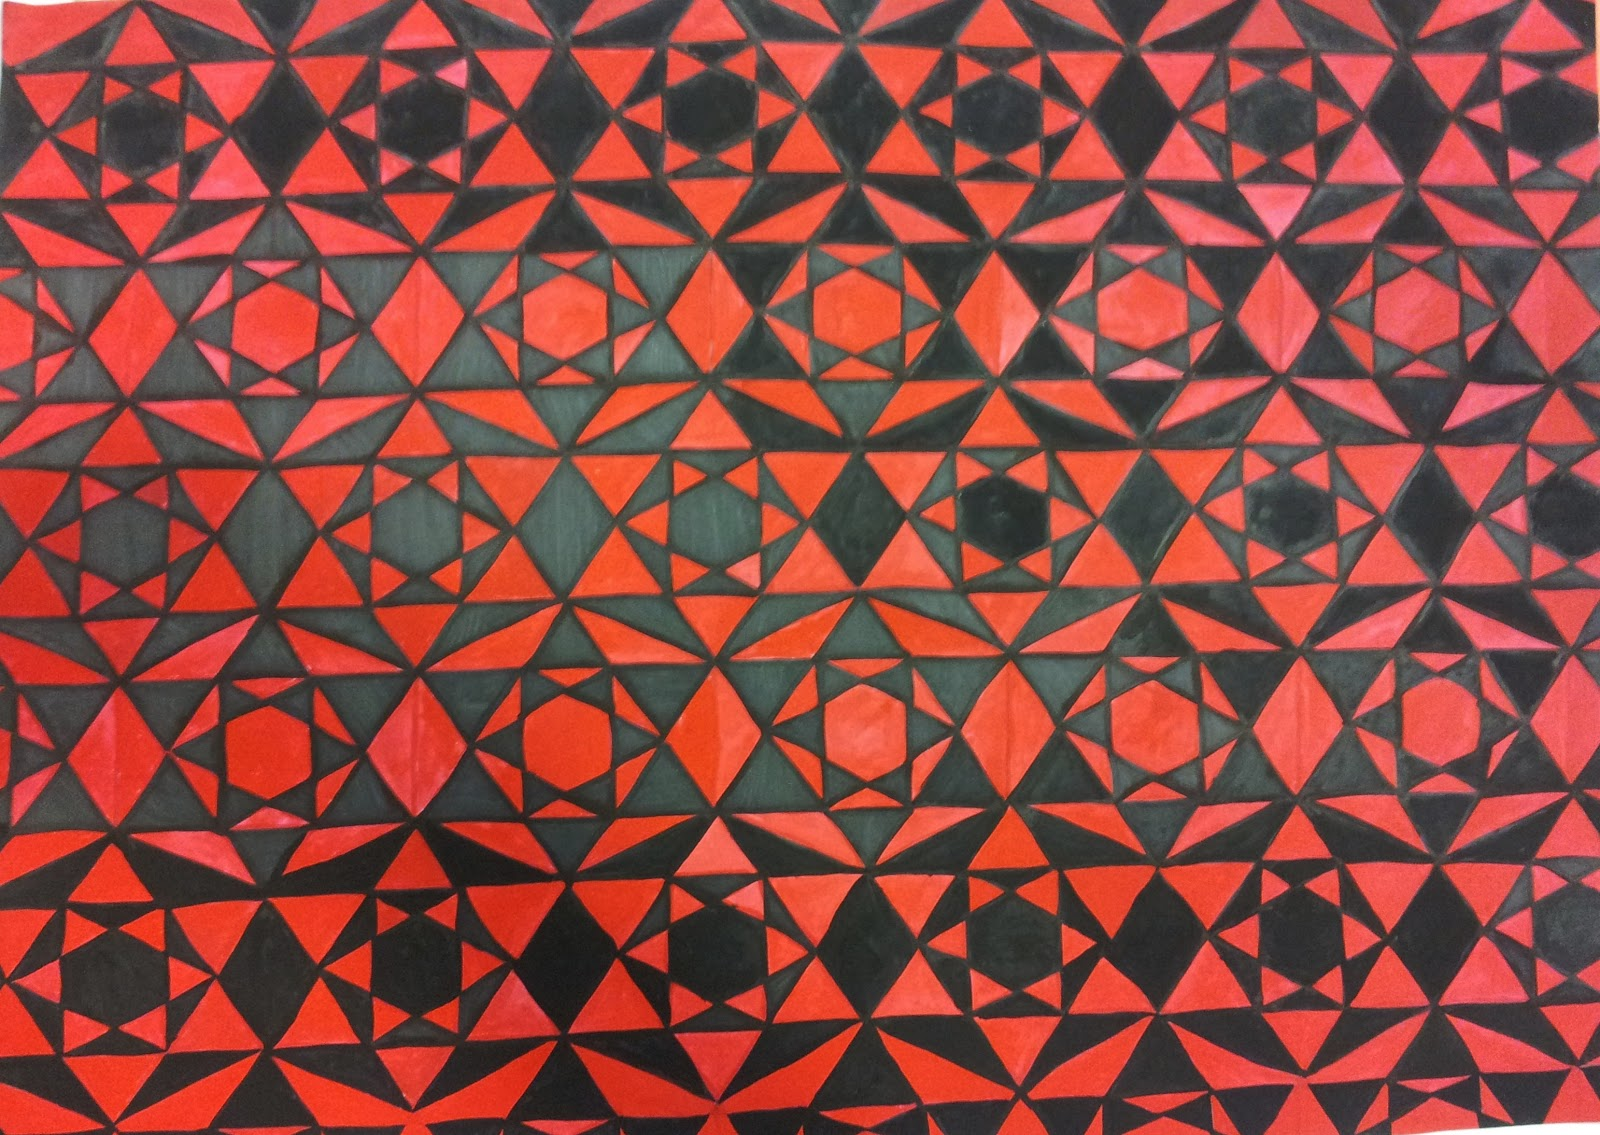 Hot Christmas: Tessellation (My work)